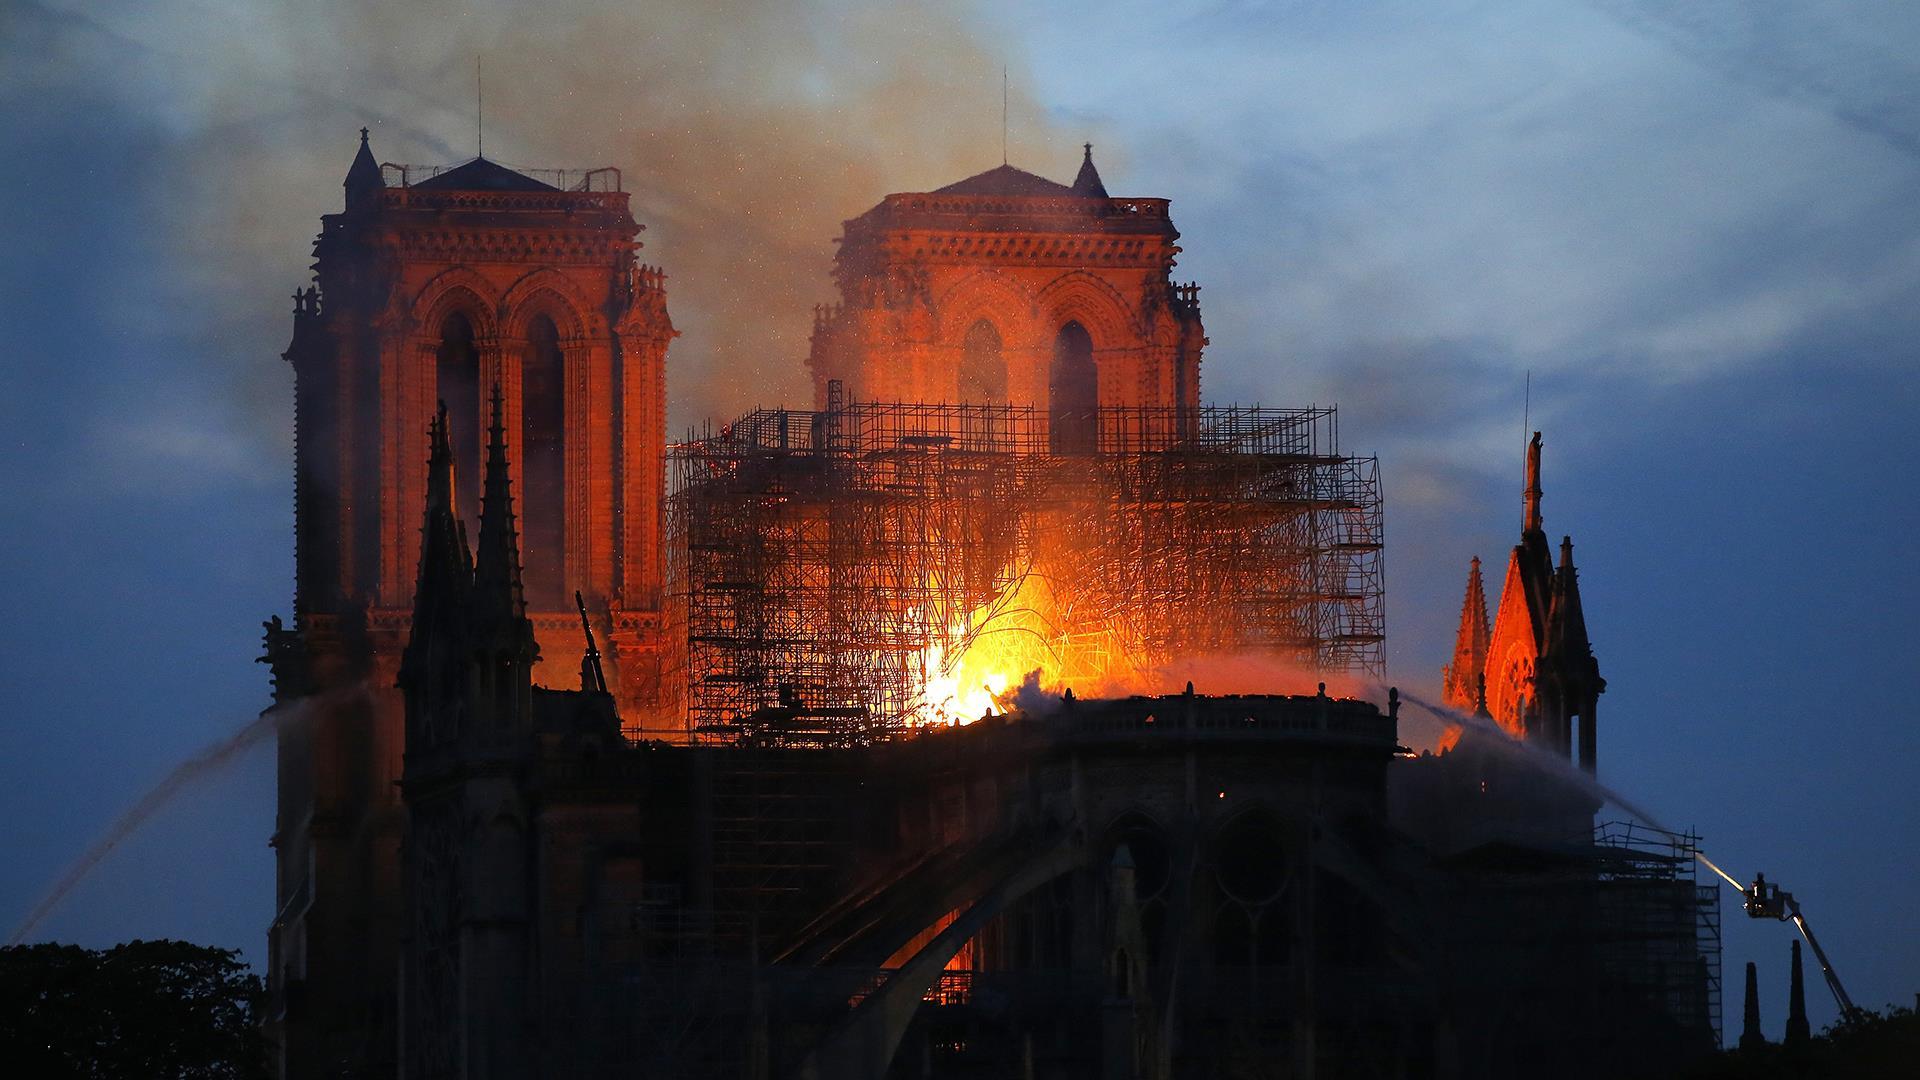 Notre Dame Cathedral fire ravages 'transcendental' cultural treasure